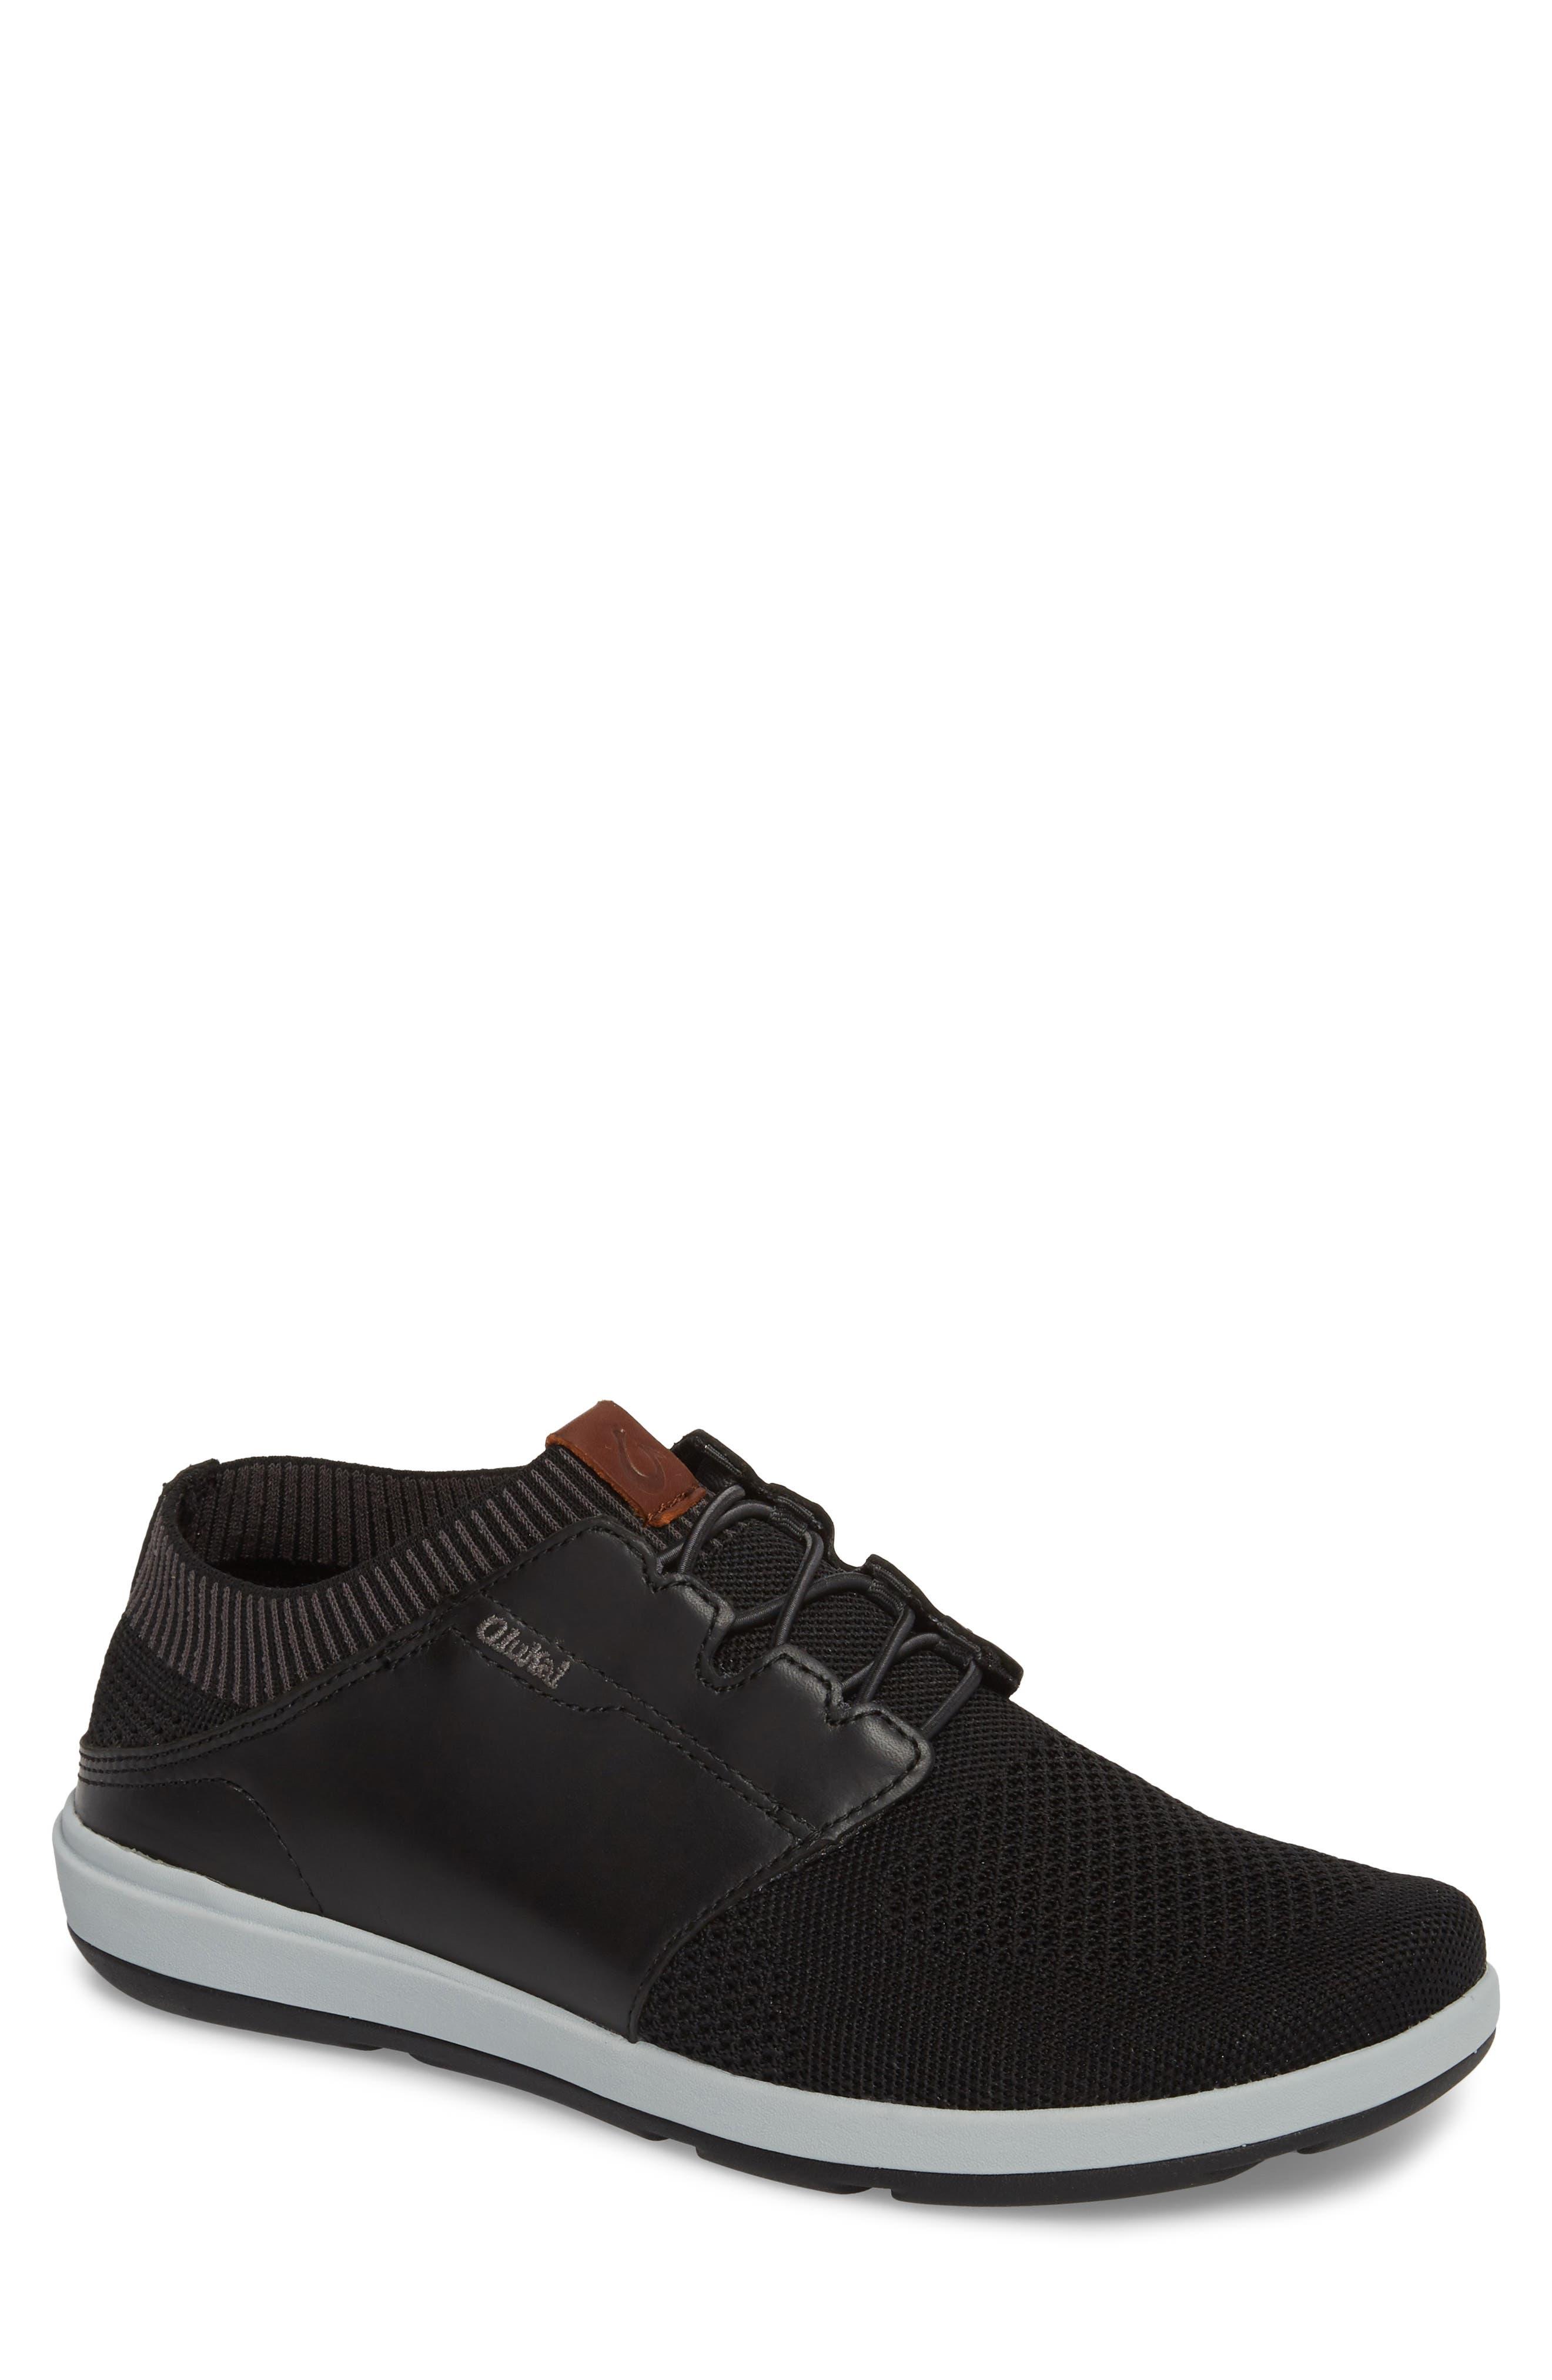 Makia Ulana Sneaker,                         Main,                         color, Black/ Black